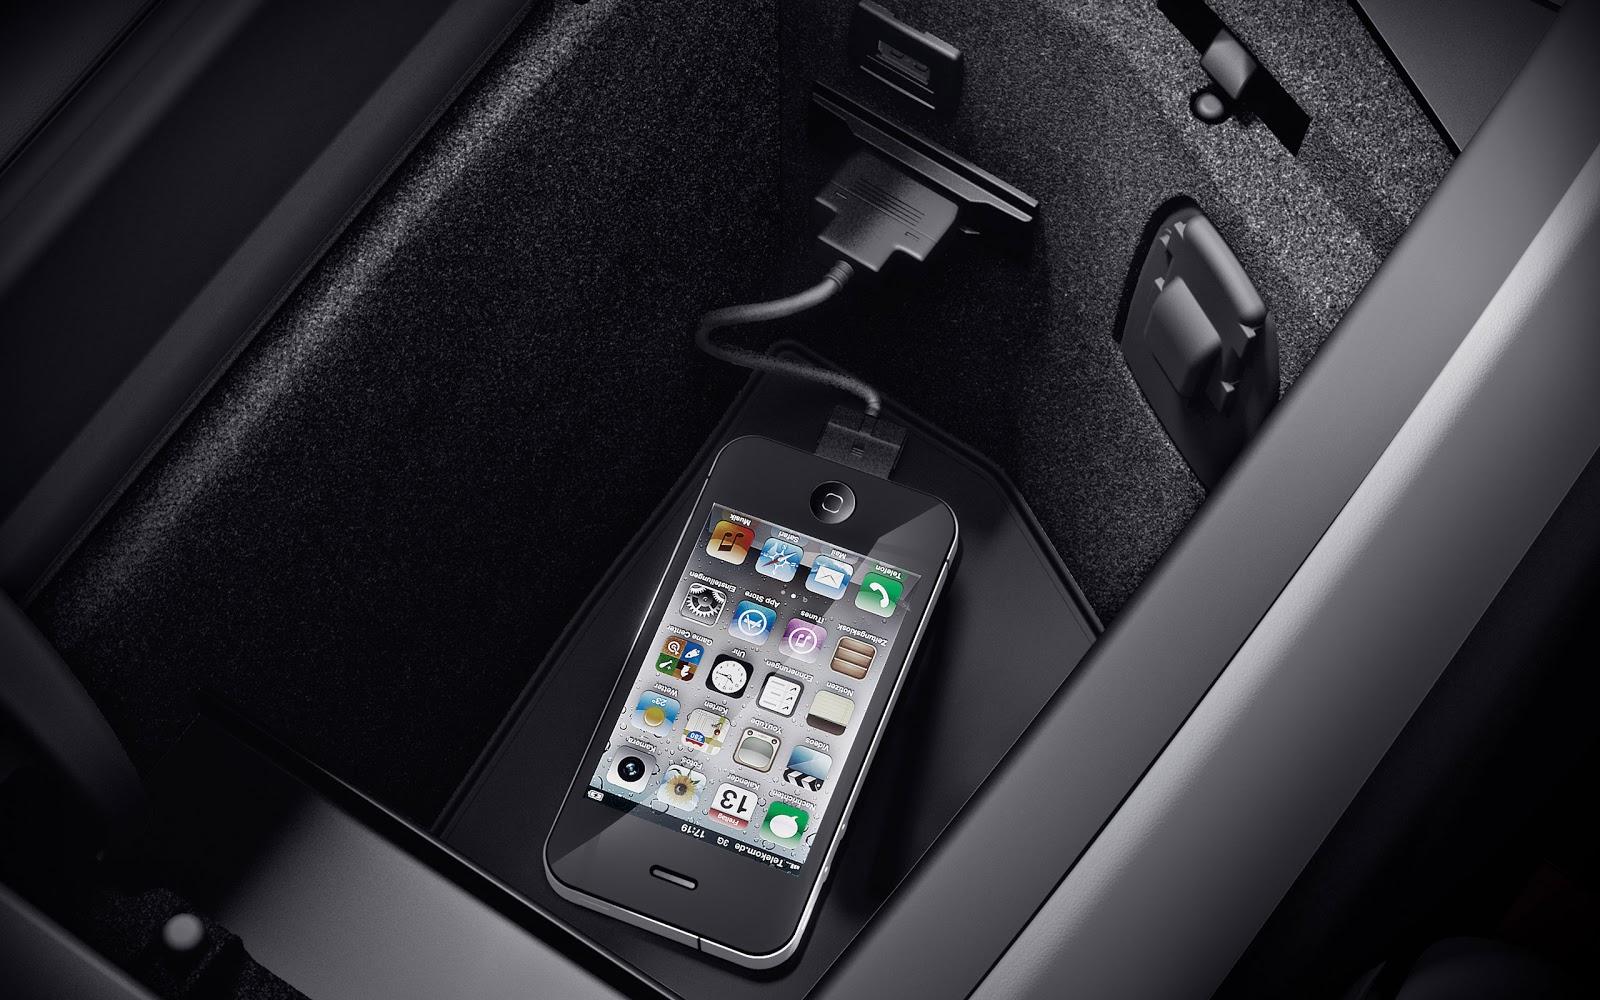 http://3.bp.blogspot.com/-IJqdt-jpjy0/UJ72jRJIwKI/AAAAAAAAH38/uxBYzzm_VFQ/s1600/GL-Class-SUV-2013-Mercedes+Benz-interior-IPOD-connector.jpg